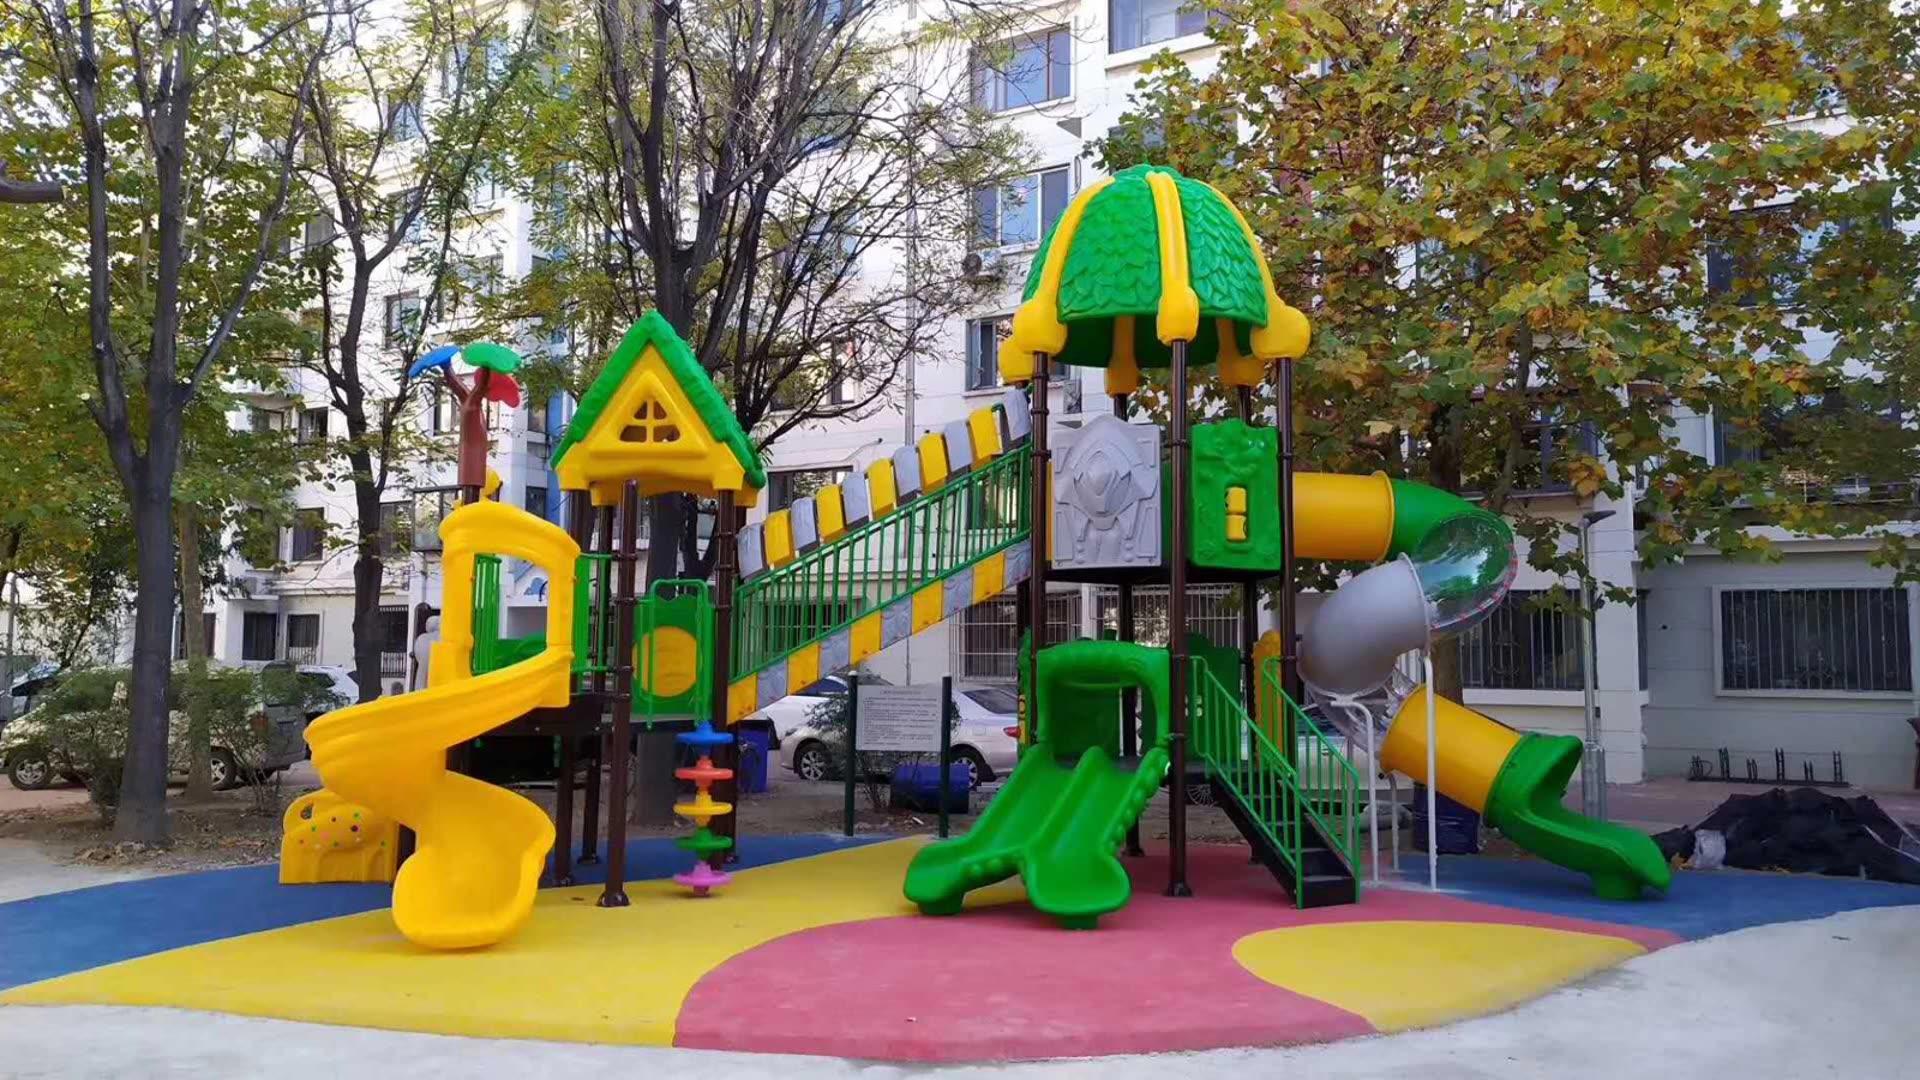 multifunctional children outdoor play area playground kids plastic slide swing outdoor playsets